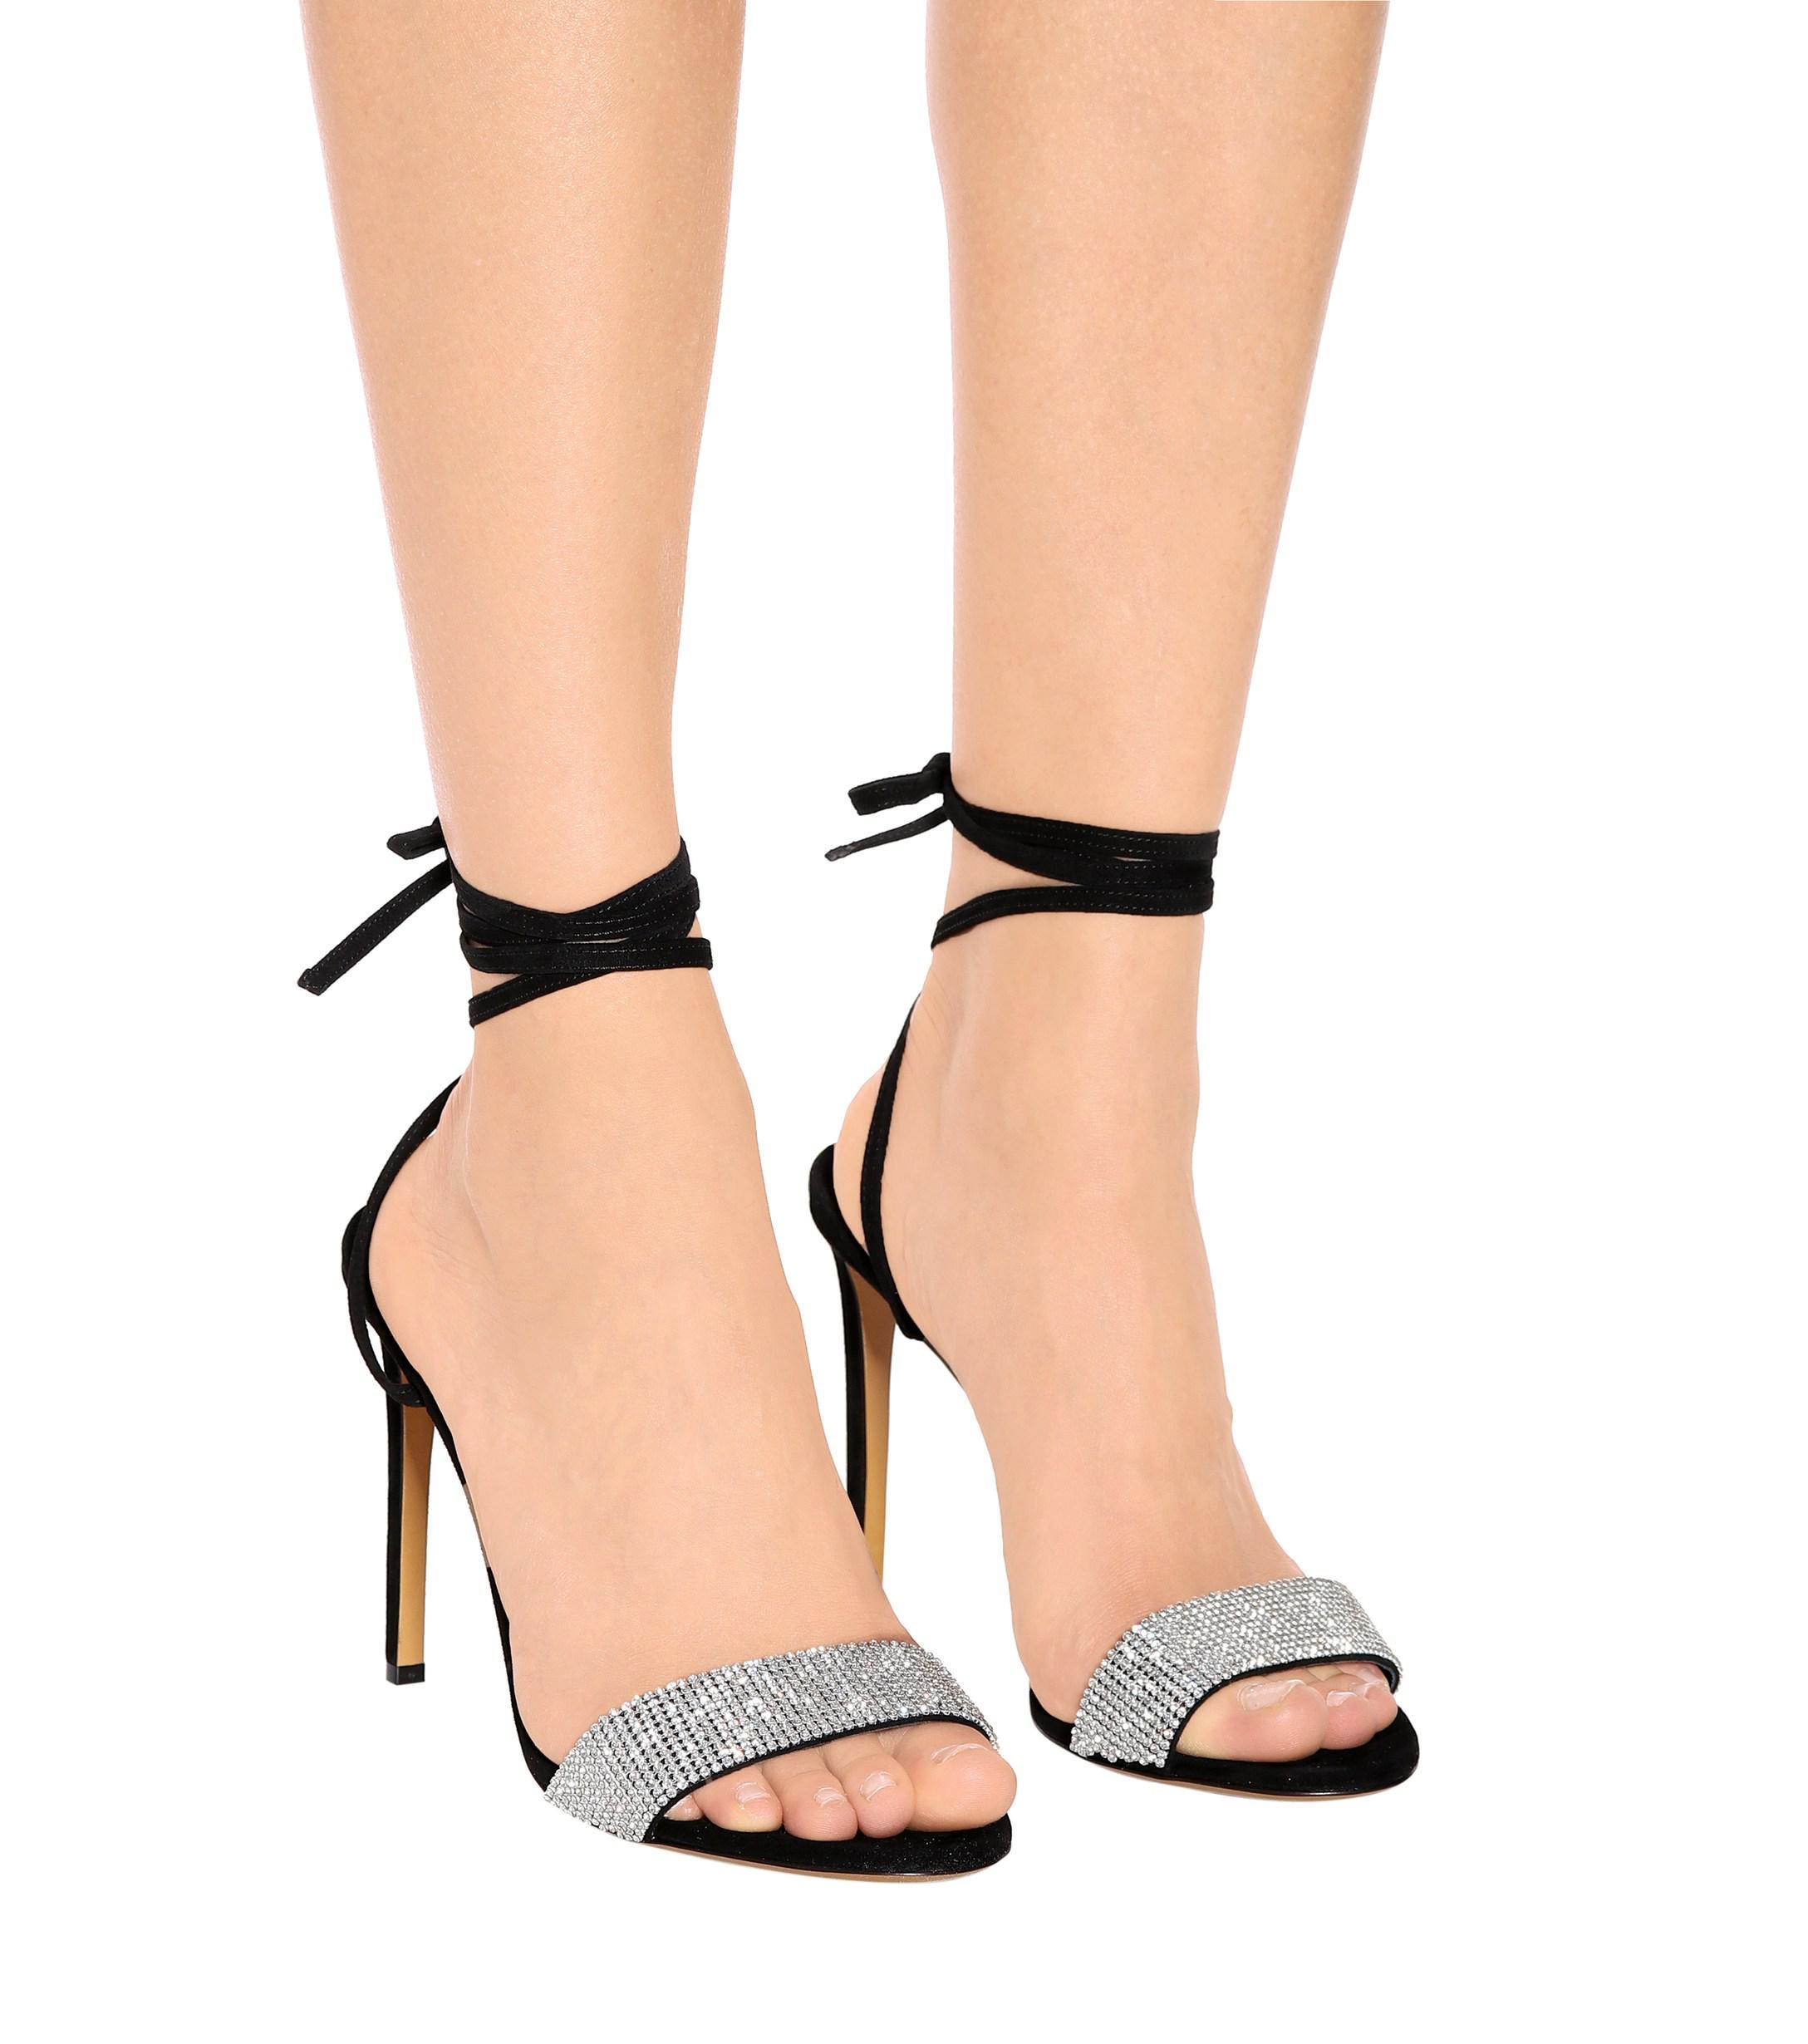 f2f9168c Alexandre Vauthier - Black Kim Crystal-embellished Sandals - Lyst. View  fullscreen